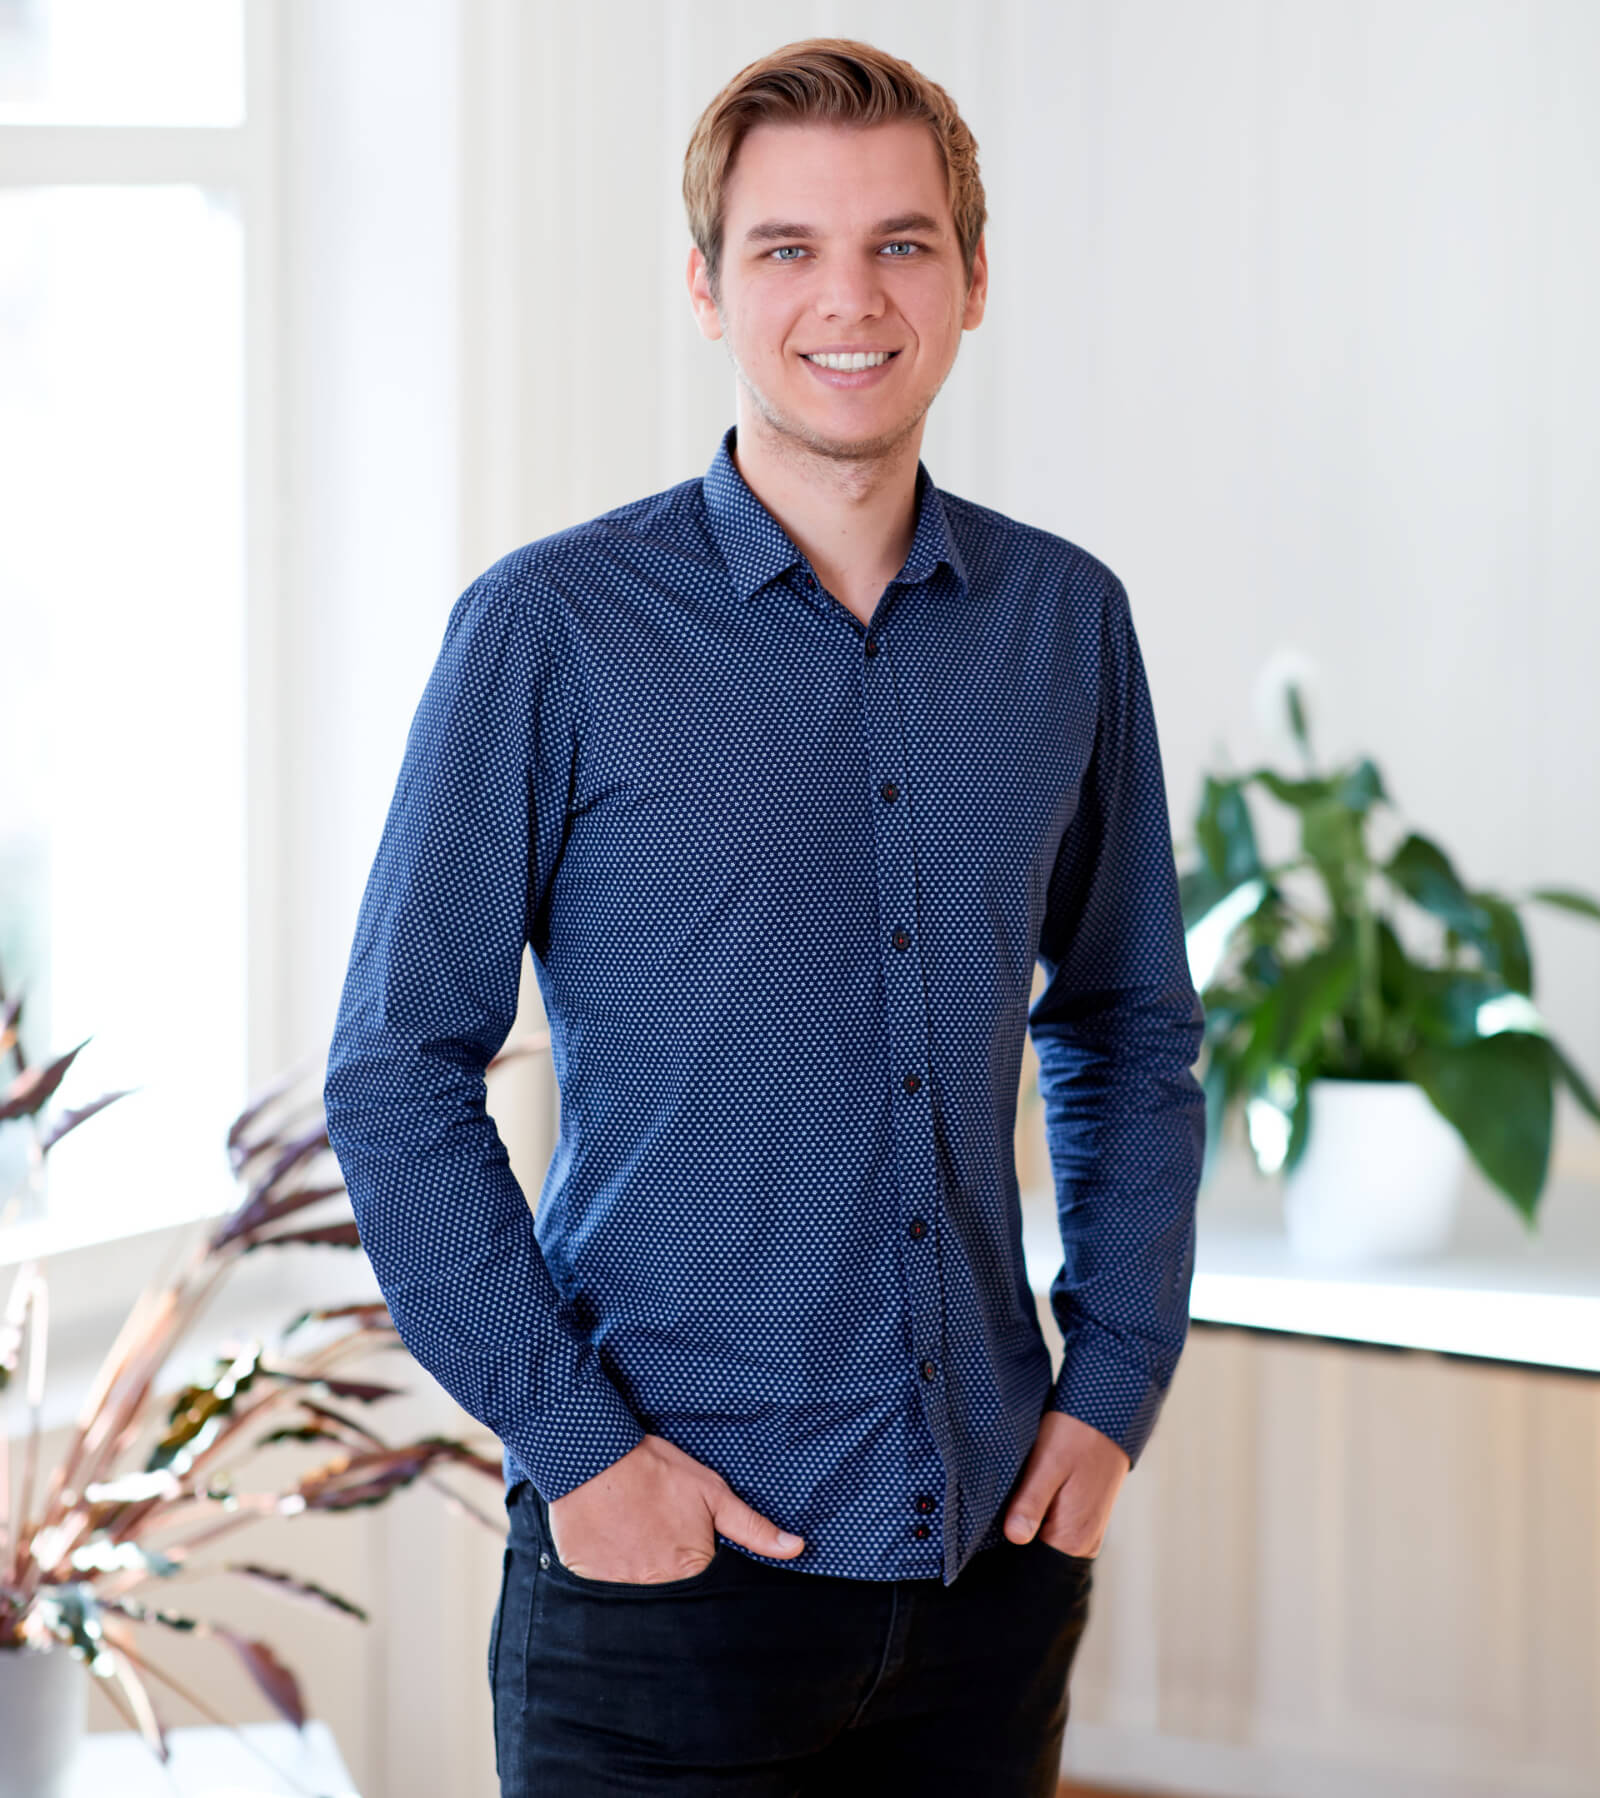 Clemens Bathon